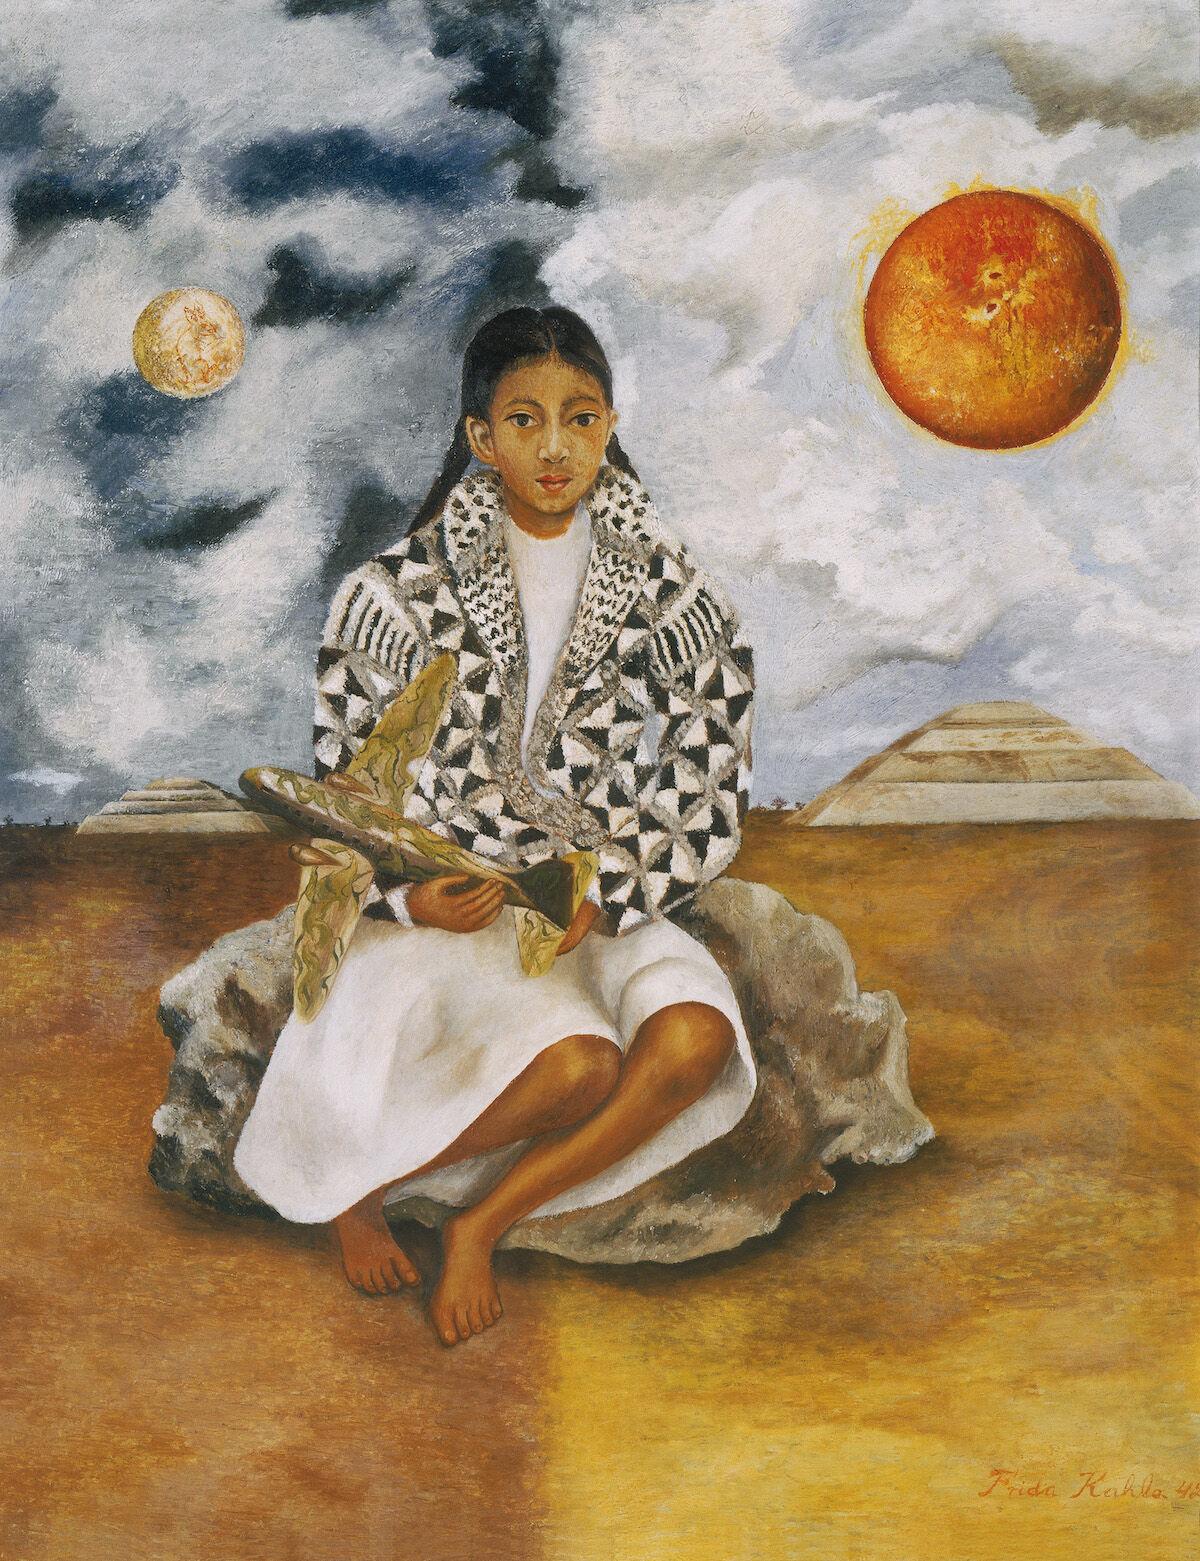 Frida Kahlo,  Niña tehuacana, Lucha María (Sol y luna)  ( Girl from Tehuacán, Lucha María  [ Sun and Moon ]), 1942. © 2019 Banco de México Diego Rivera Frida Kahlo Museums Trust, Mexico, D.F. / Artists Rights Society (ARS), New York. Courtesy of Di Donna Galleries.